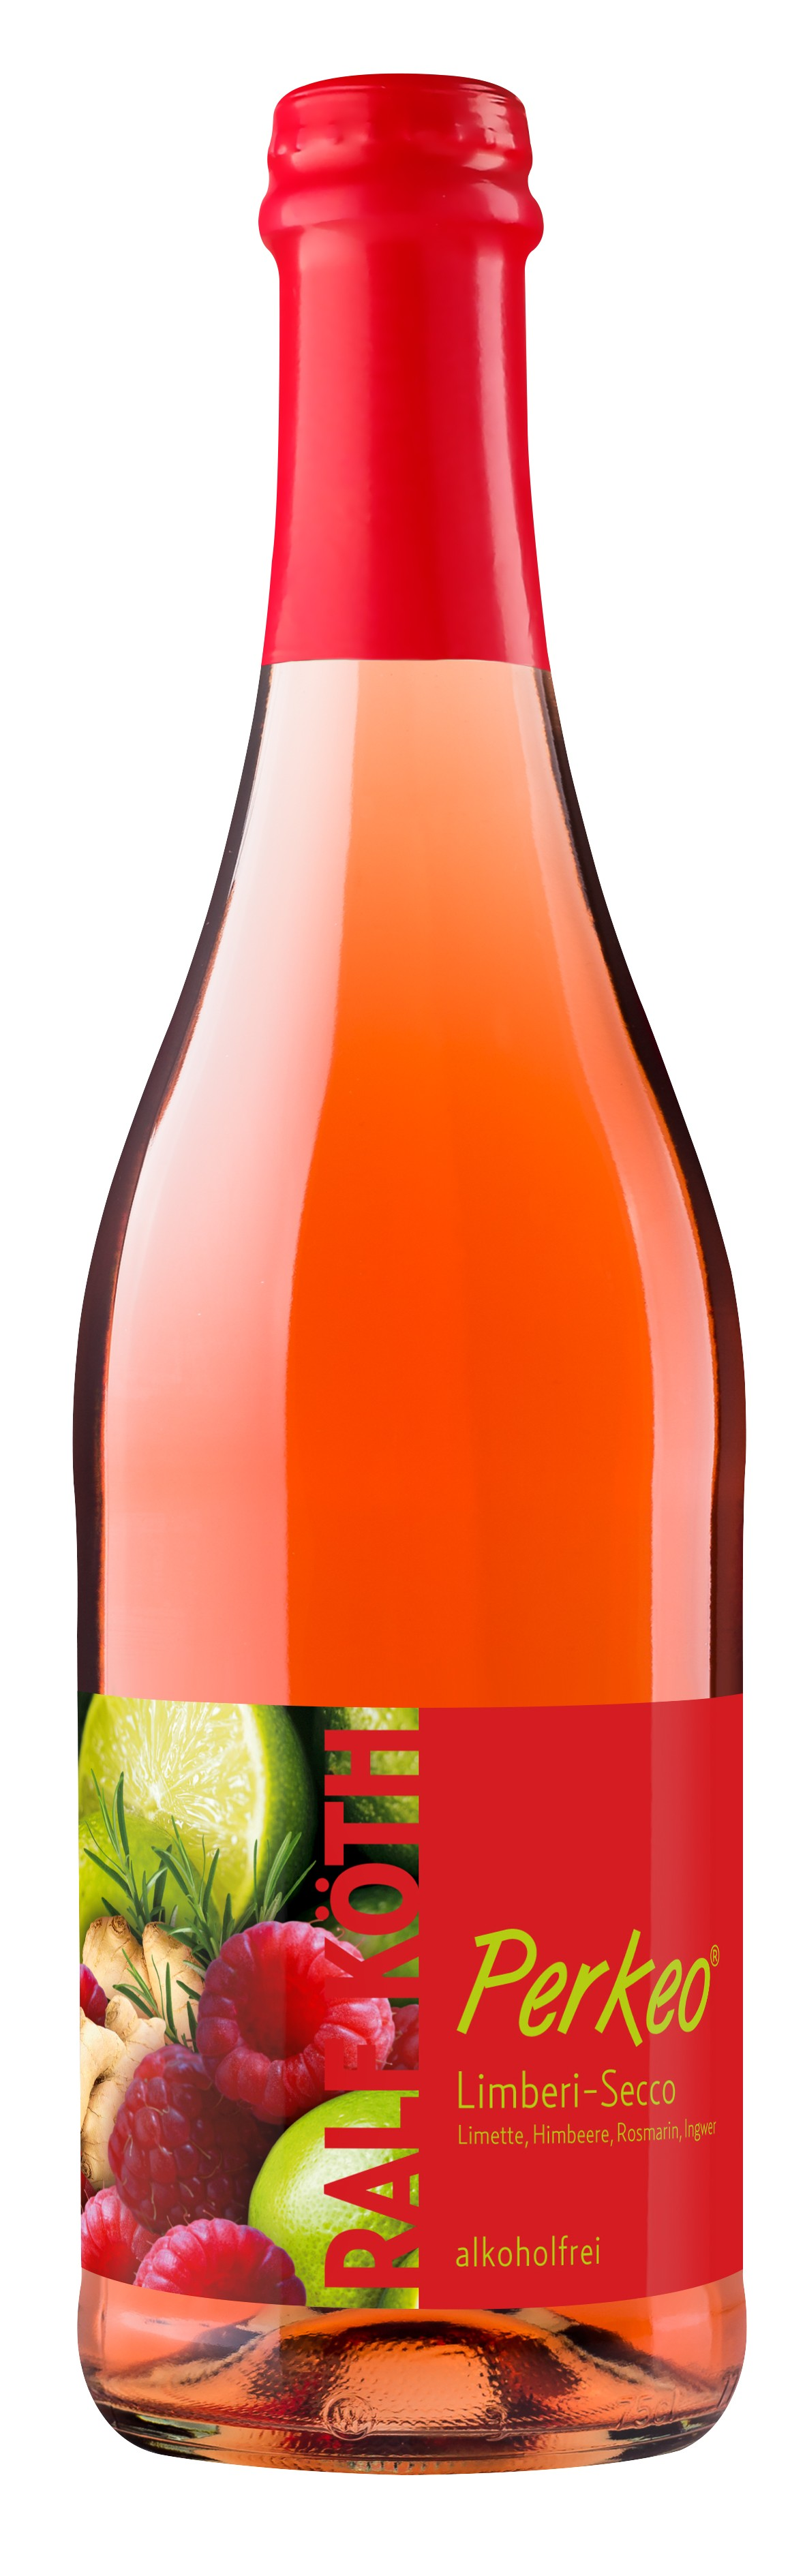 Limberi Secco Perkeo alkoholfrei 750 ml